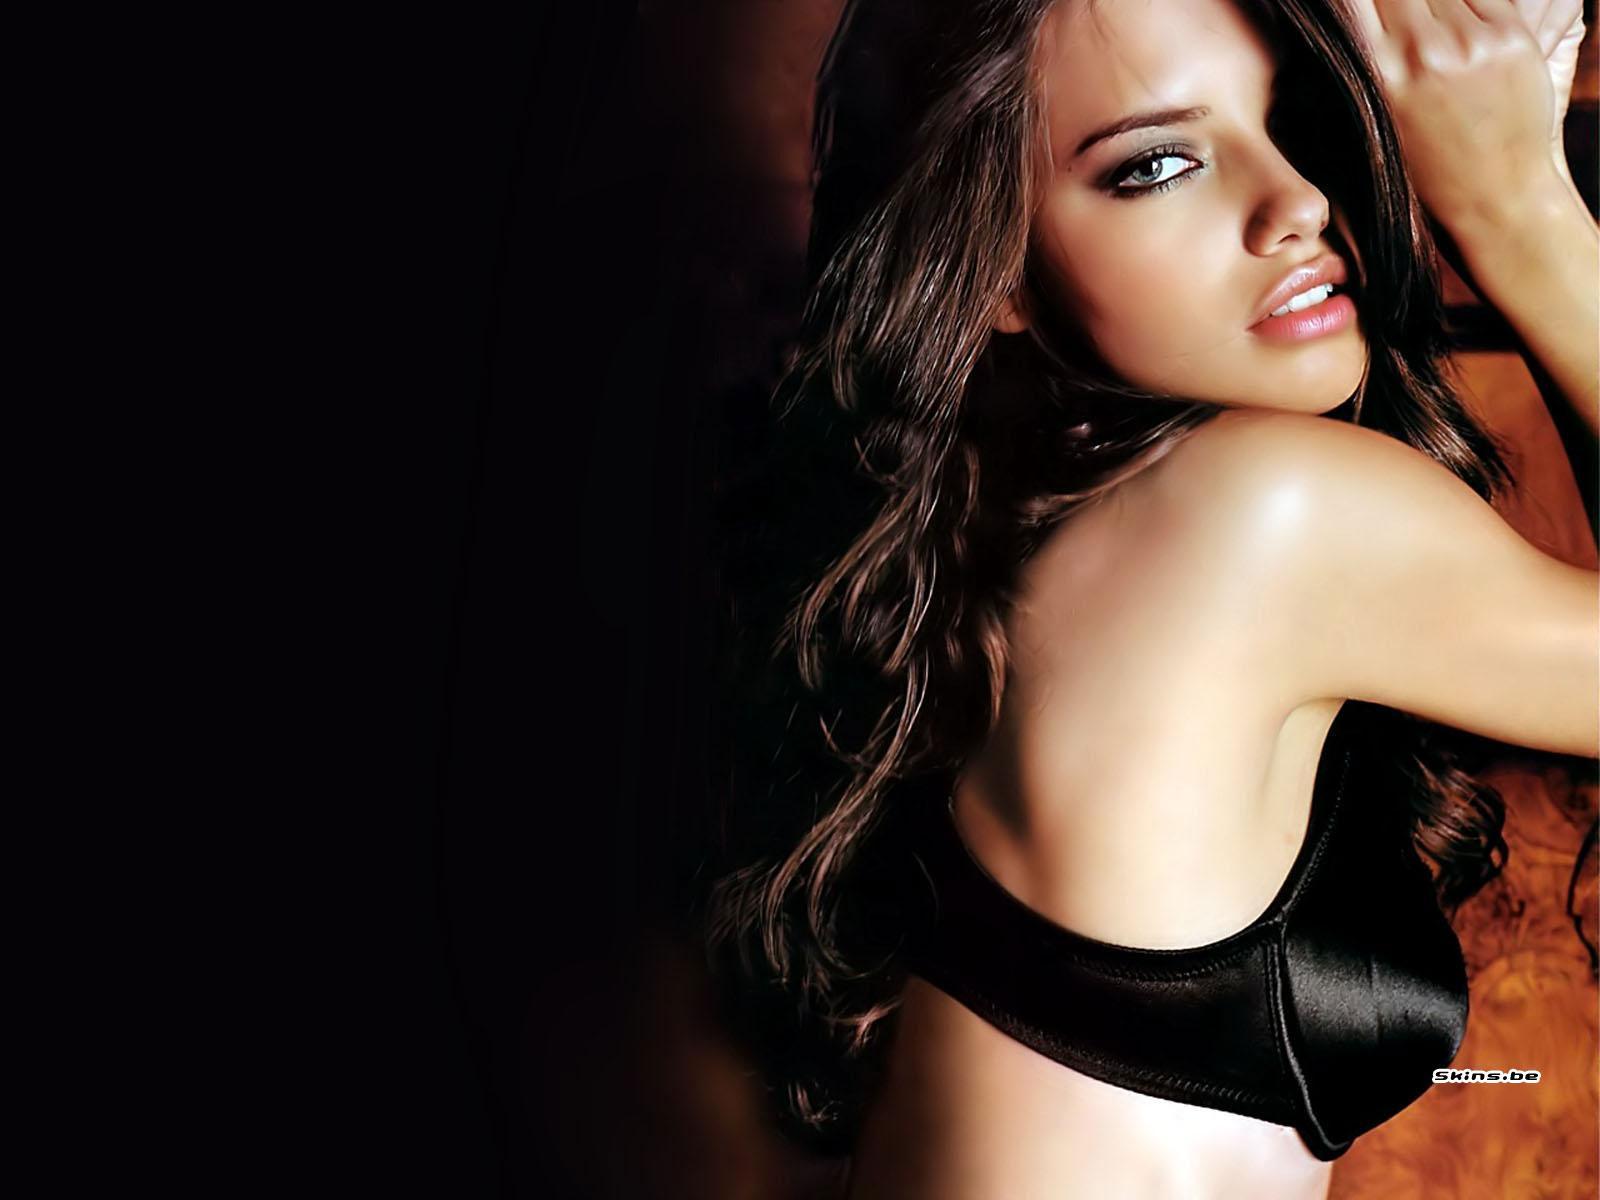 http://2.bp.blogspot.com/_GCAuqodmOE4/TFokiE1pPsI/AAAAAAAABH0/ceStp0EXFn0/s1600/Adriana+Lima_9.jpg